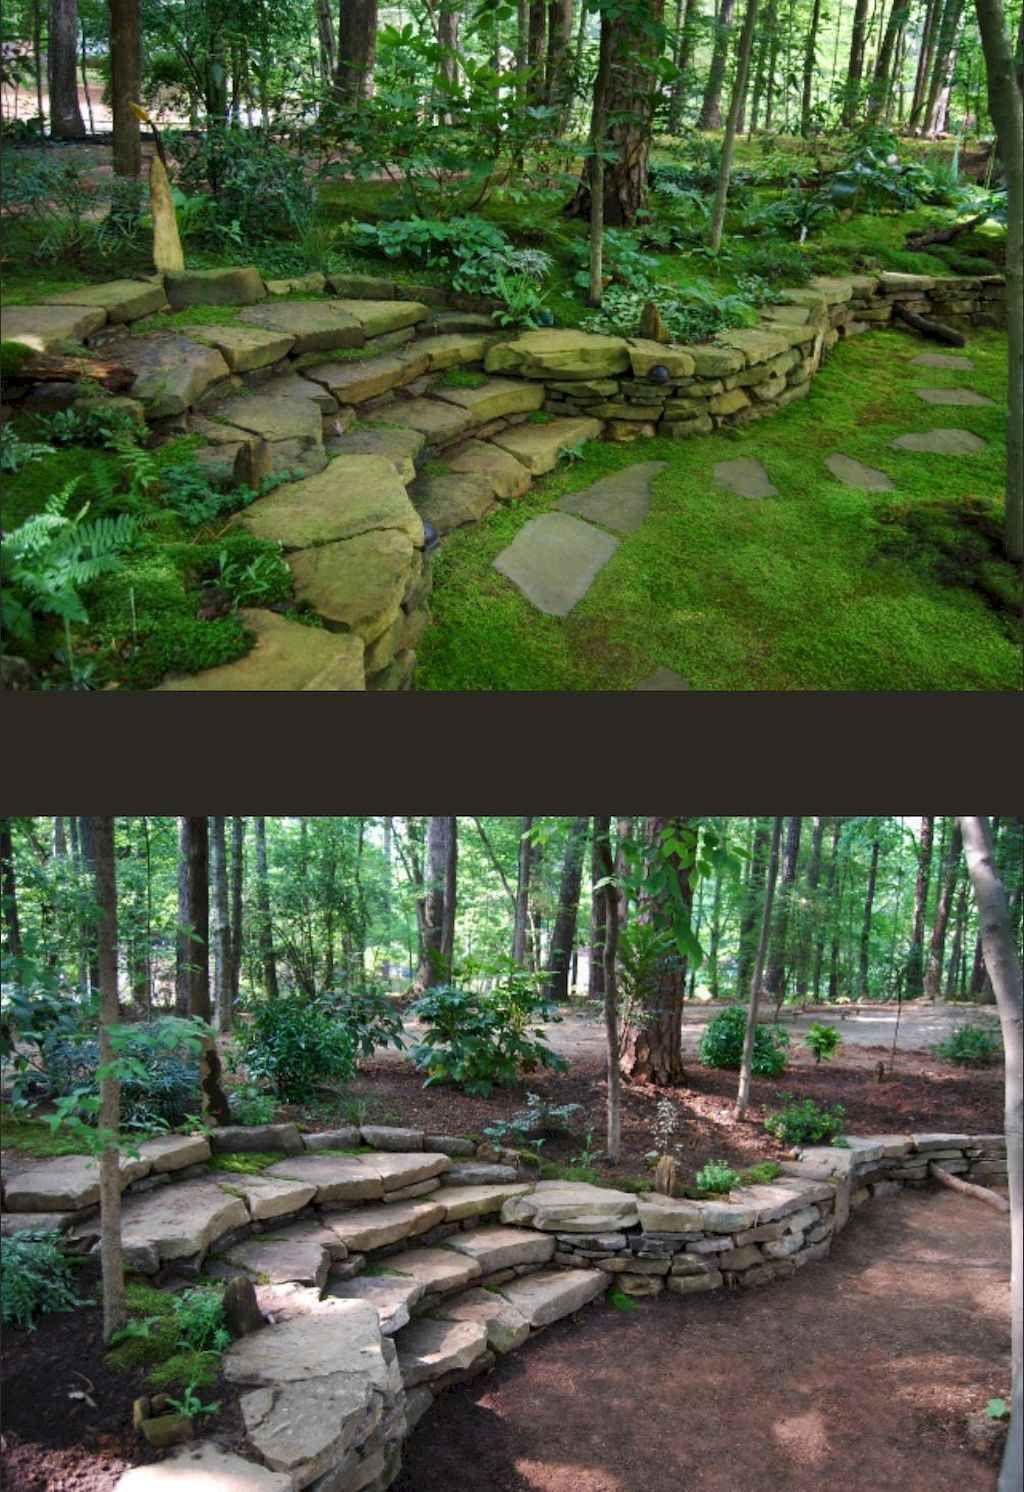 50 Stunning Front Yard Rock Garden Landscaping Ideas - DoMakeover.com #landscapingideas